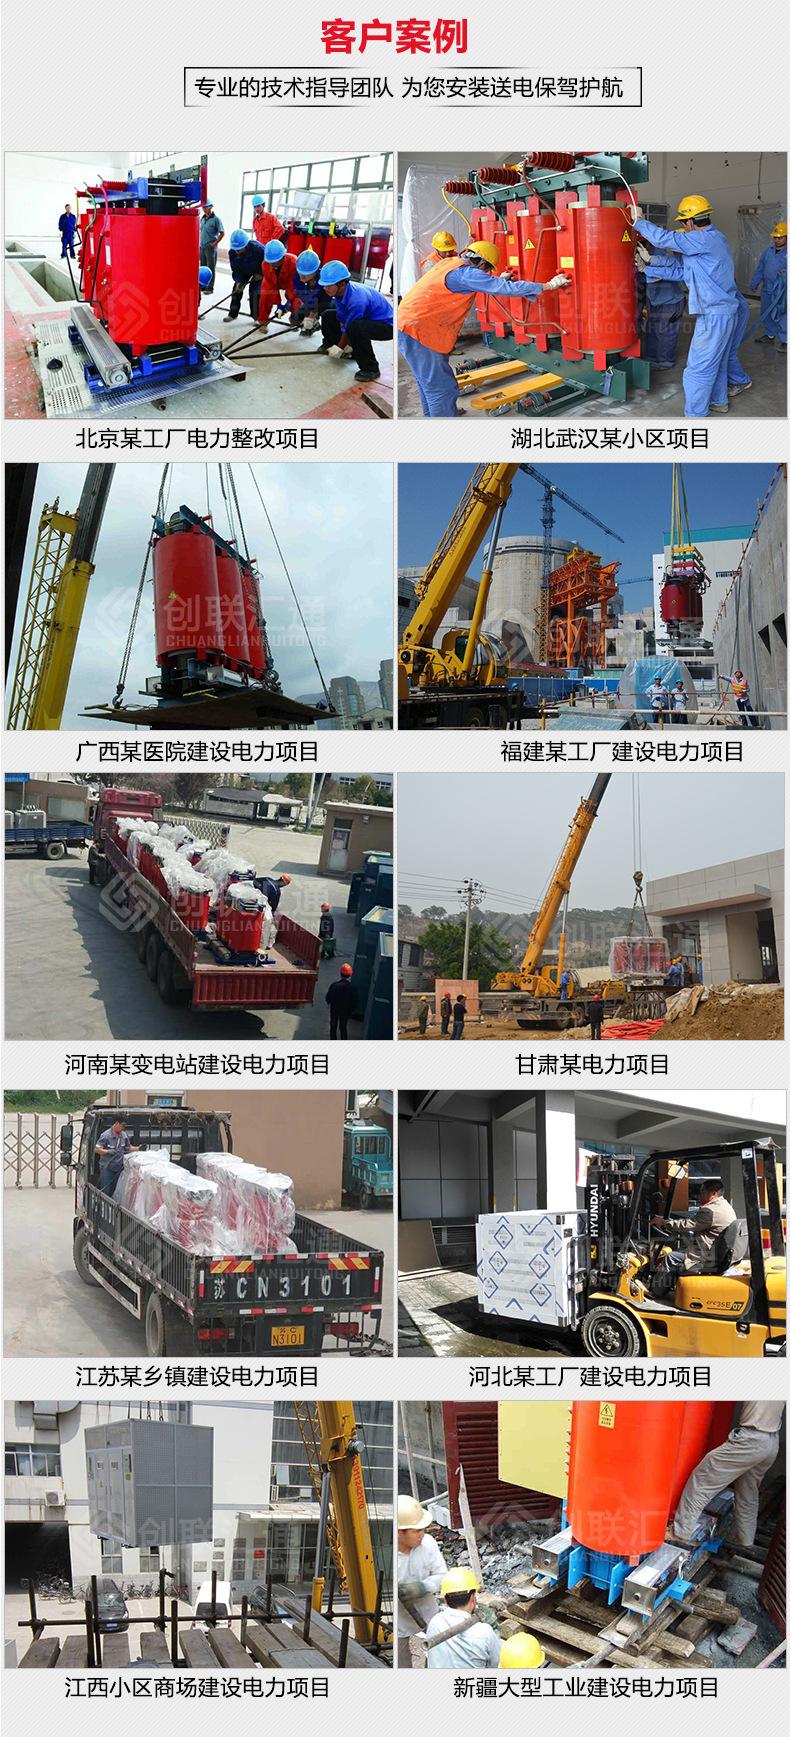 SCB10-250kva/10kv干式变压器 scb10型环氧树脂浇筑 厂家现货直销-创联汇通示例图15